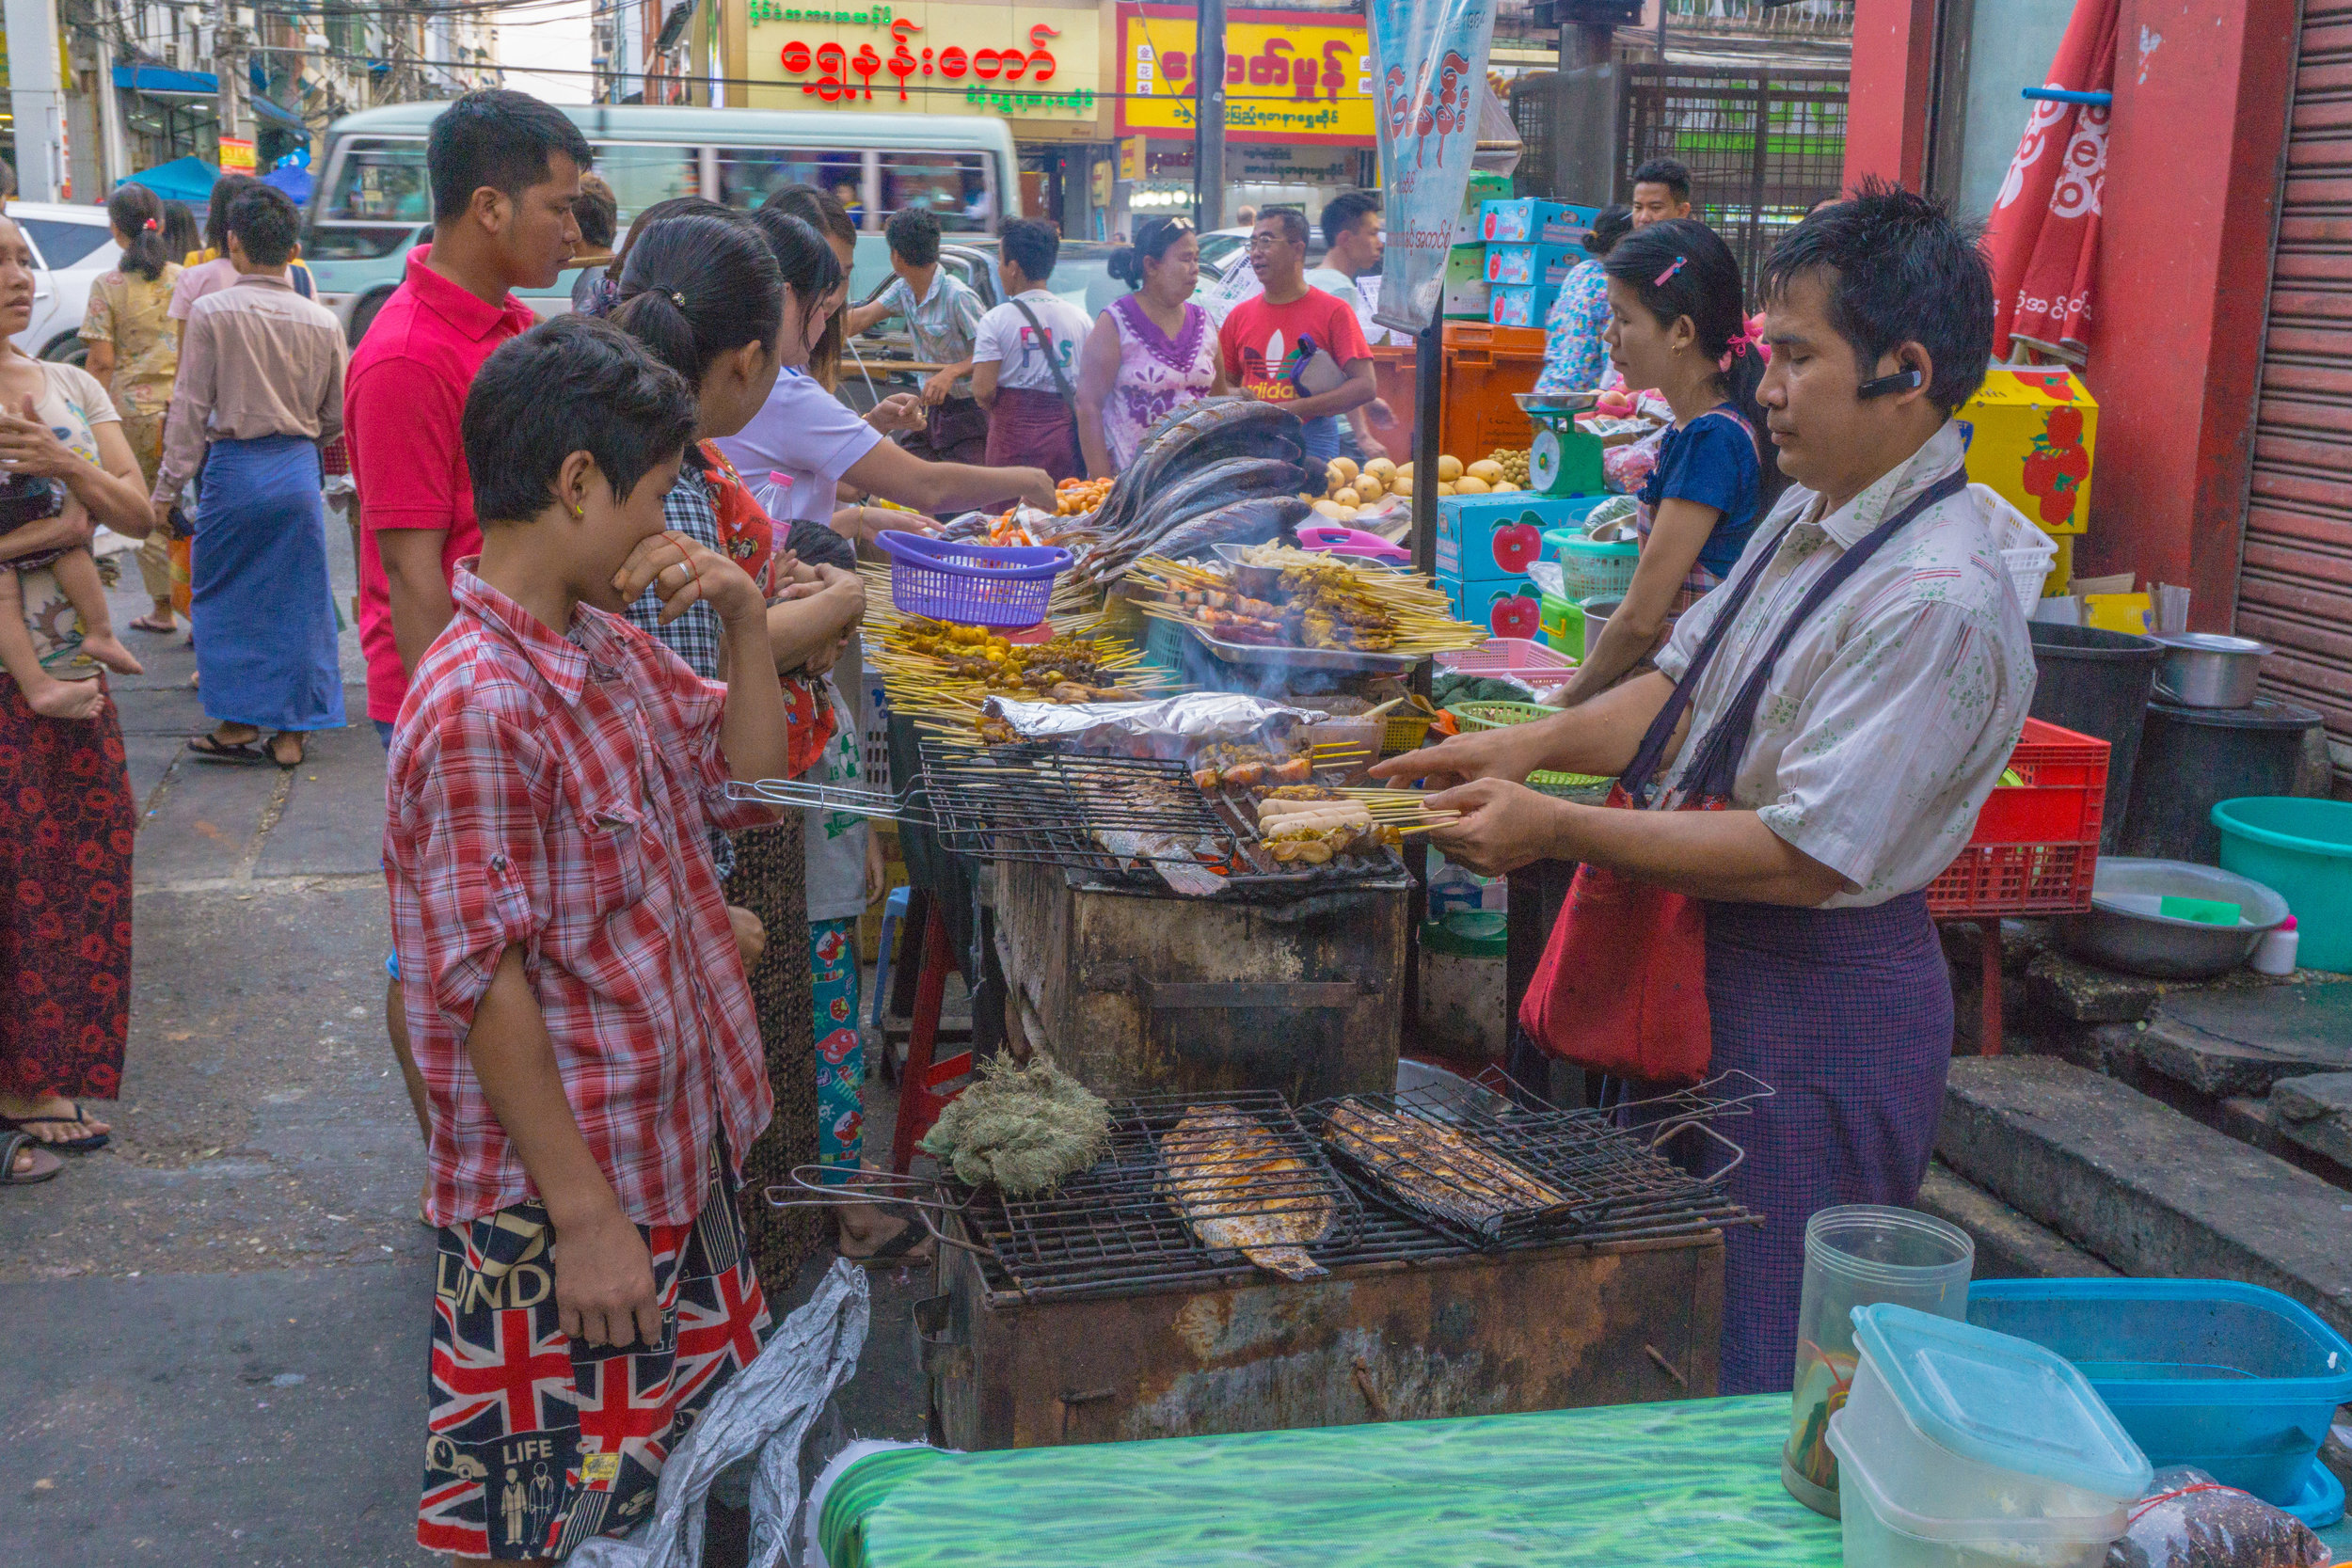 19th Street BBQ Chinatown Yangon